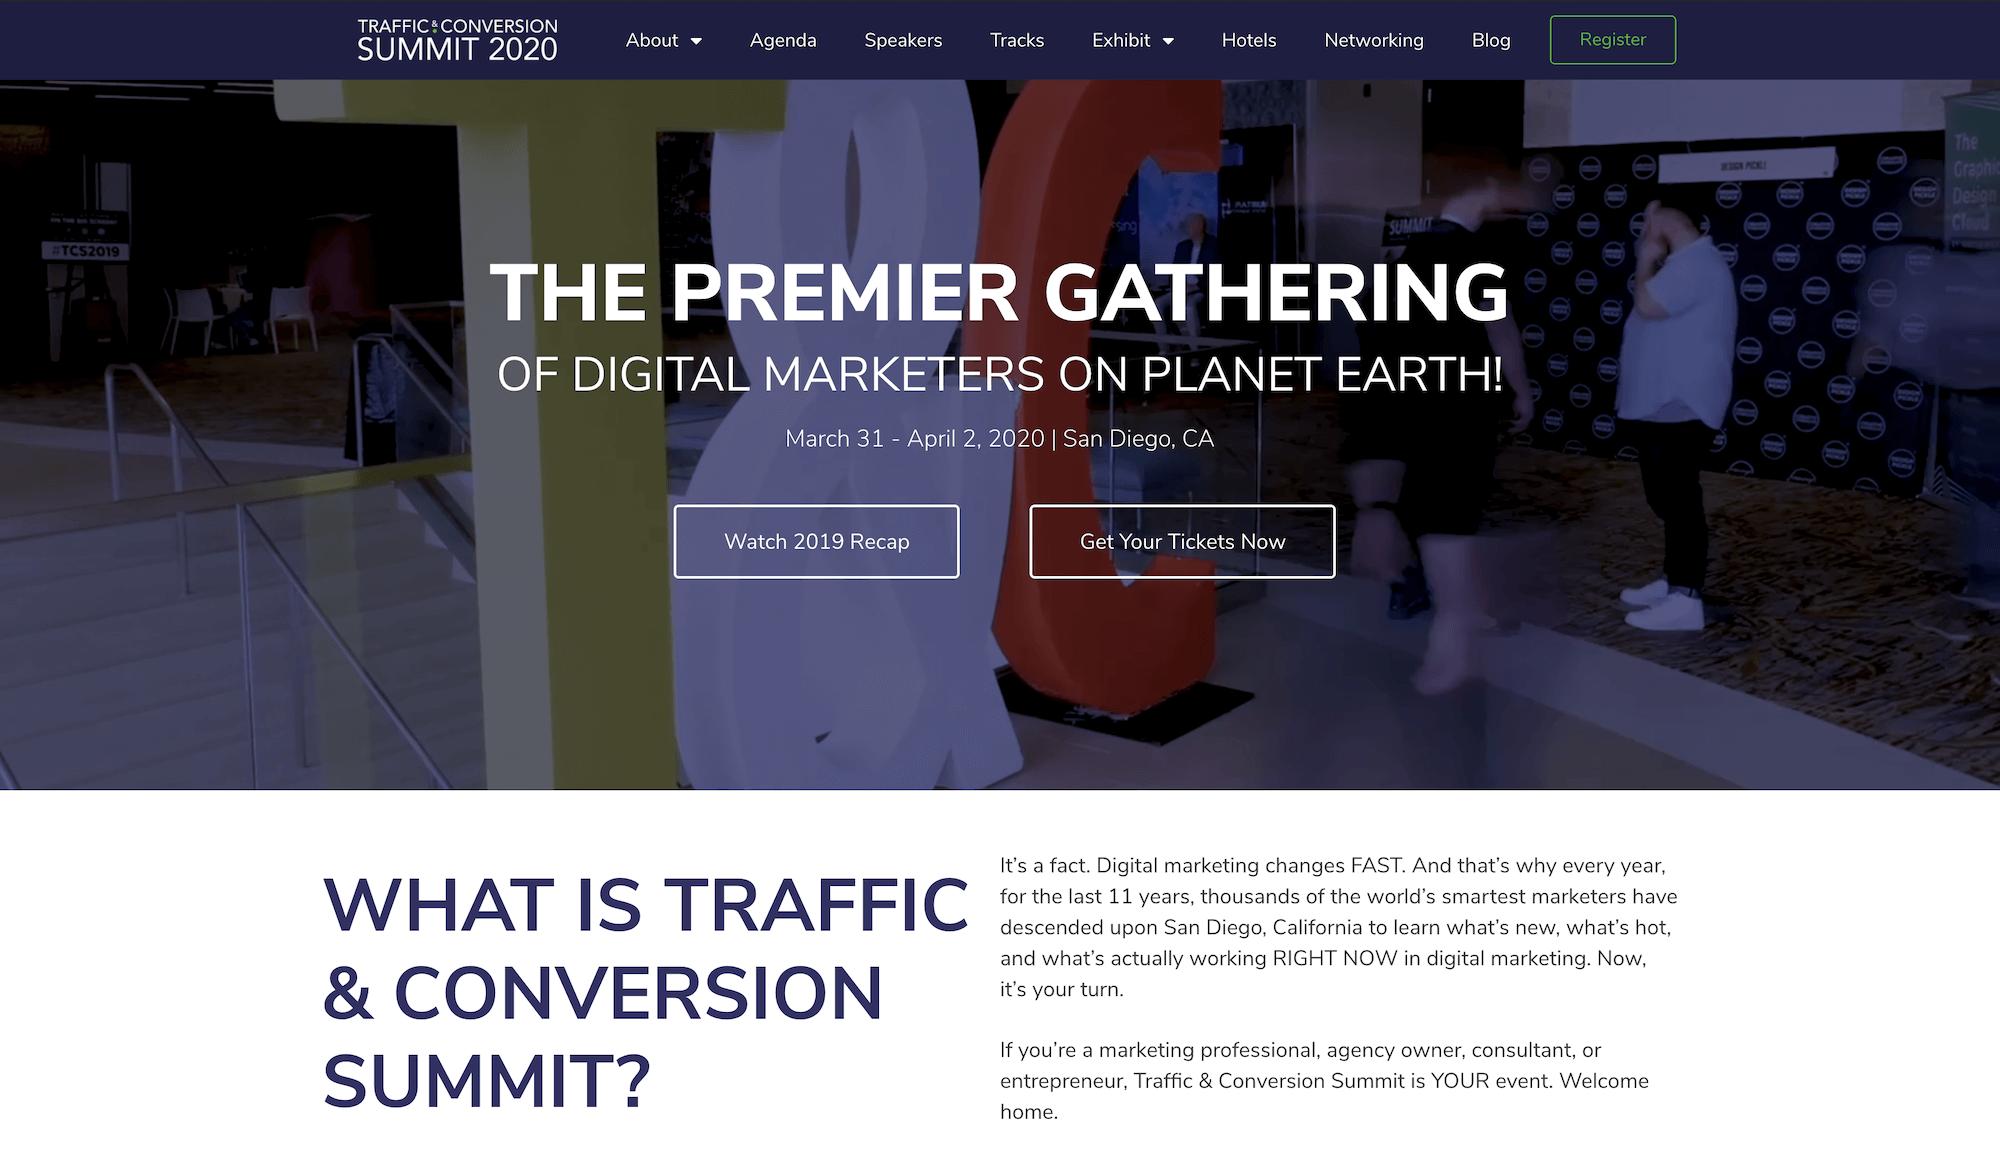 Traffic & Conversion Summit Landing Page Example